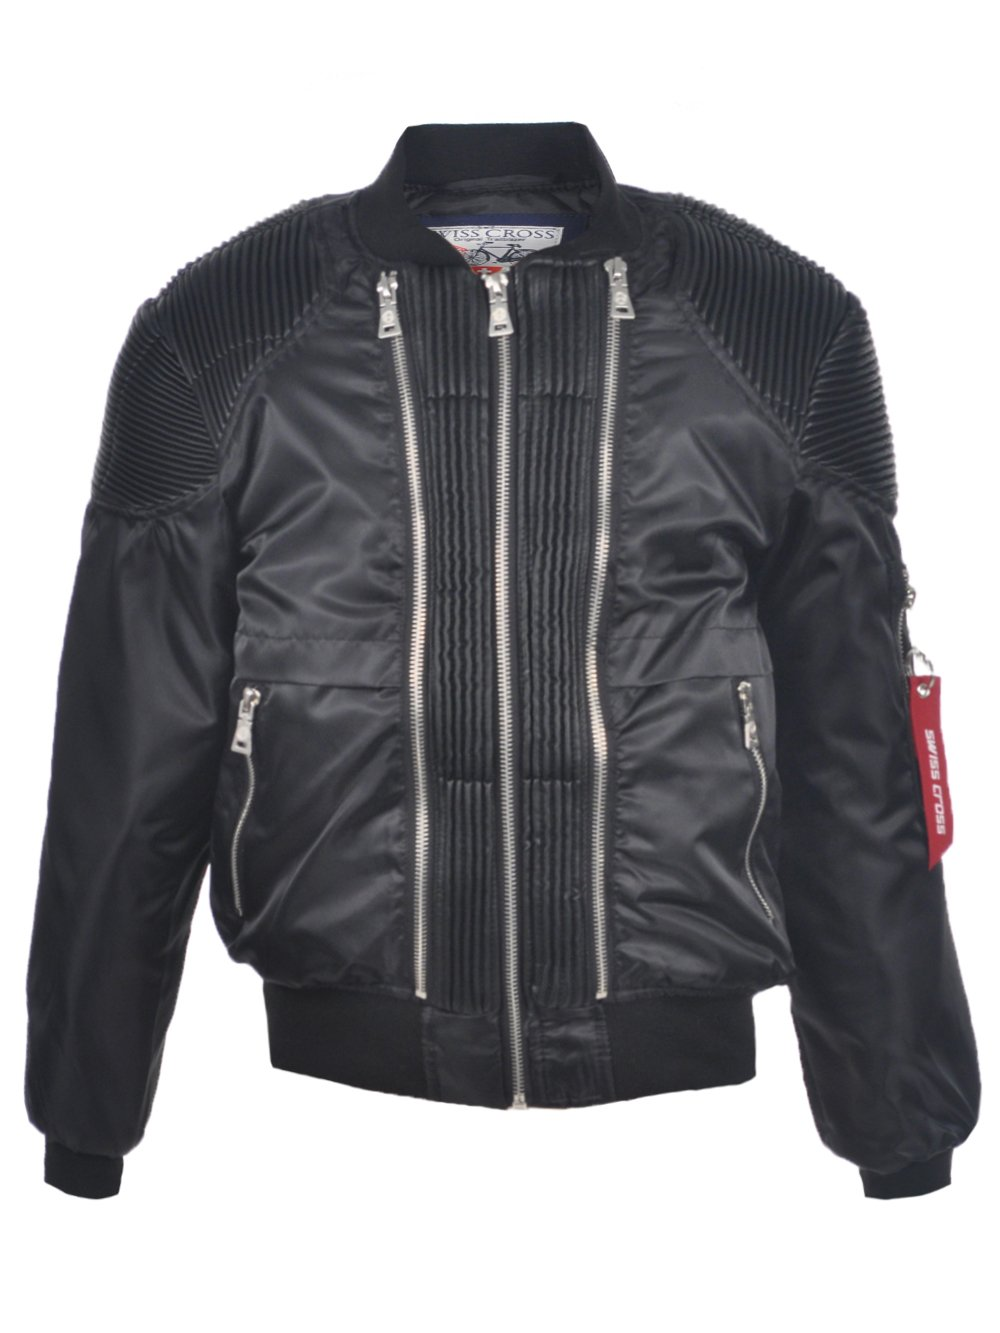 Swiss Cross Big Boys' Moto Flight Flight Jacket - Black, 14-16